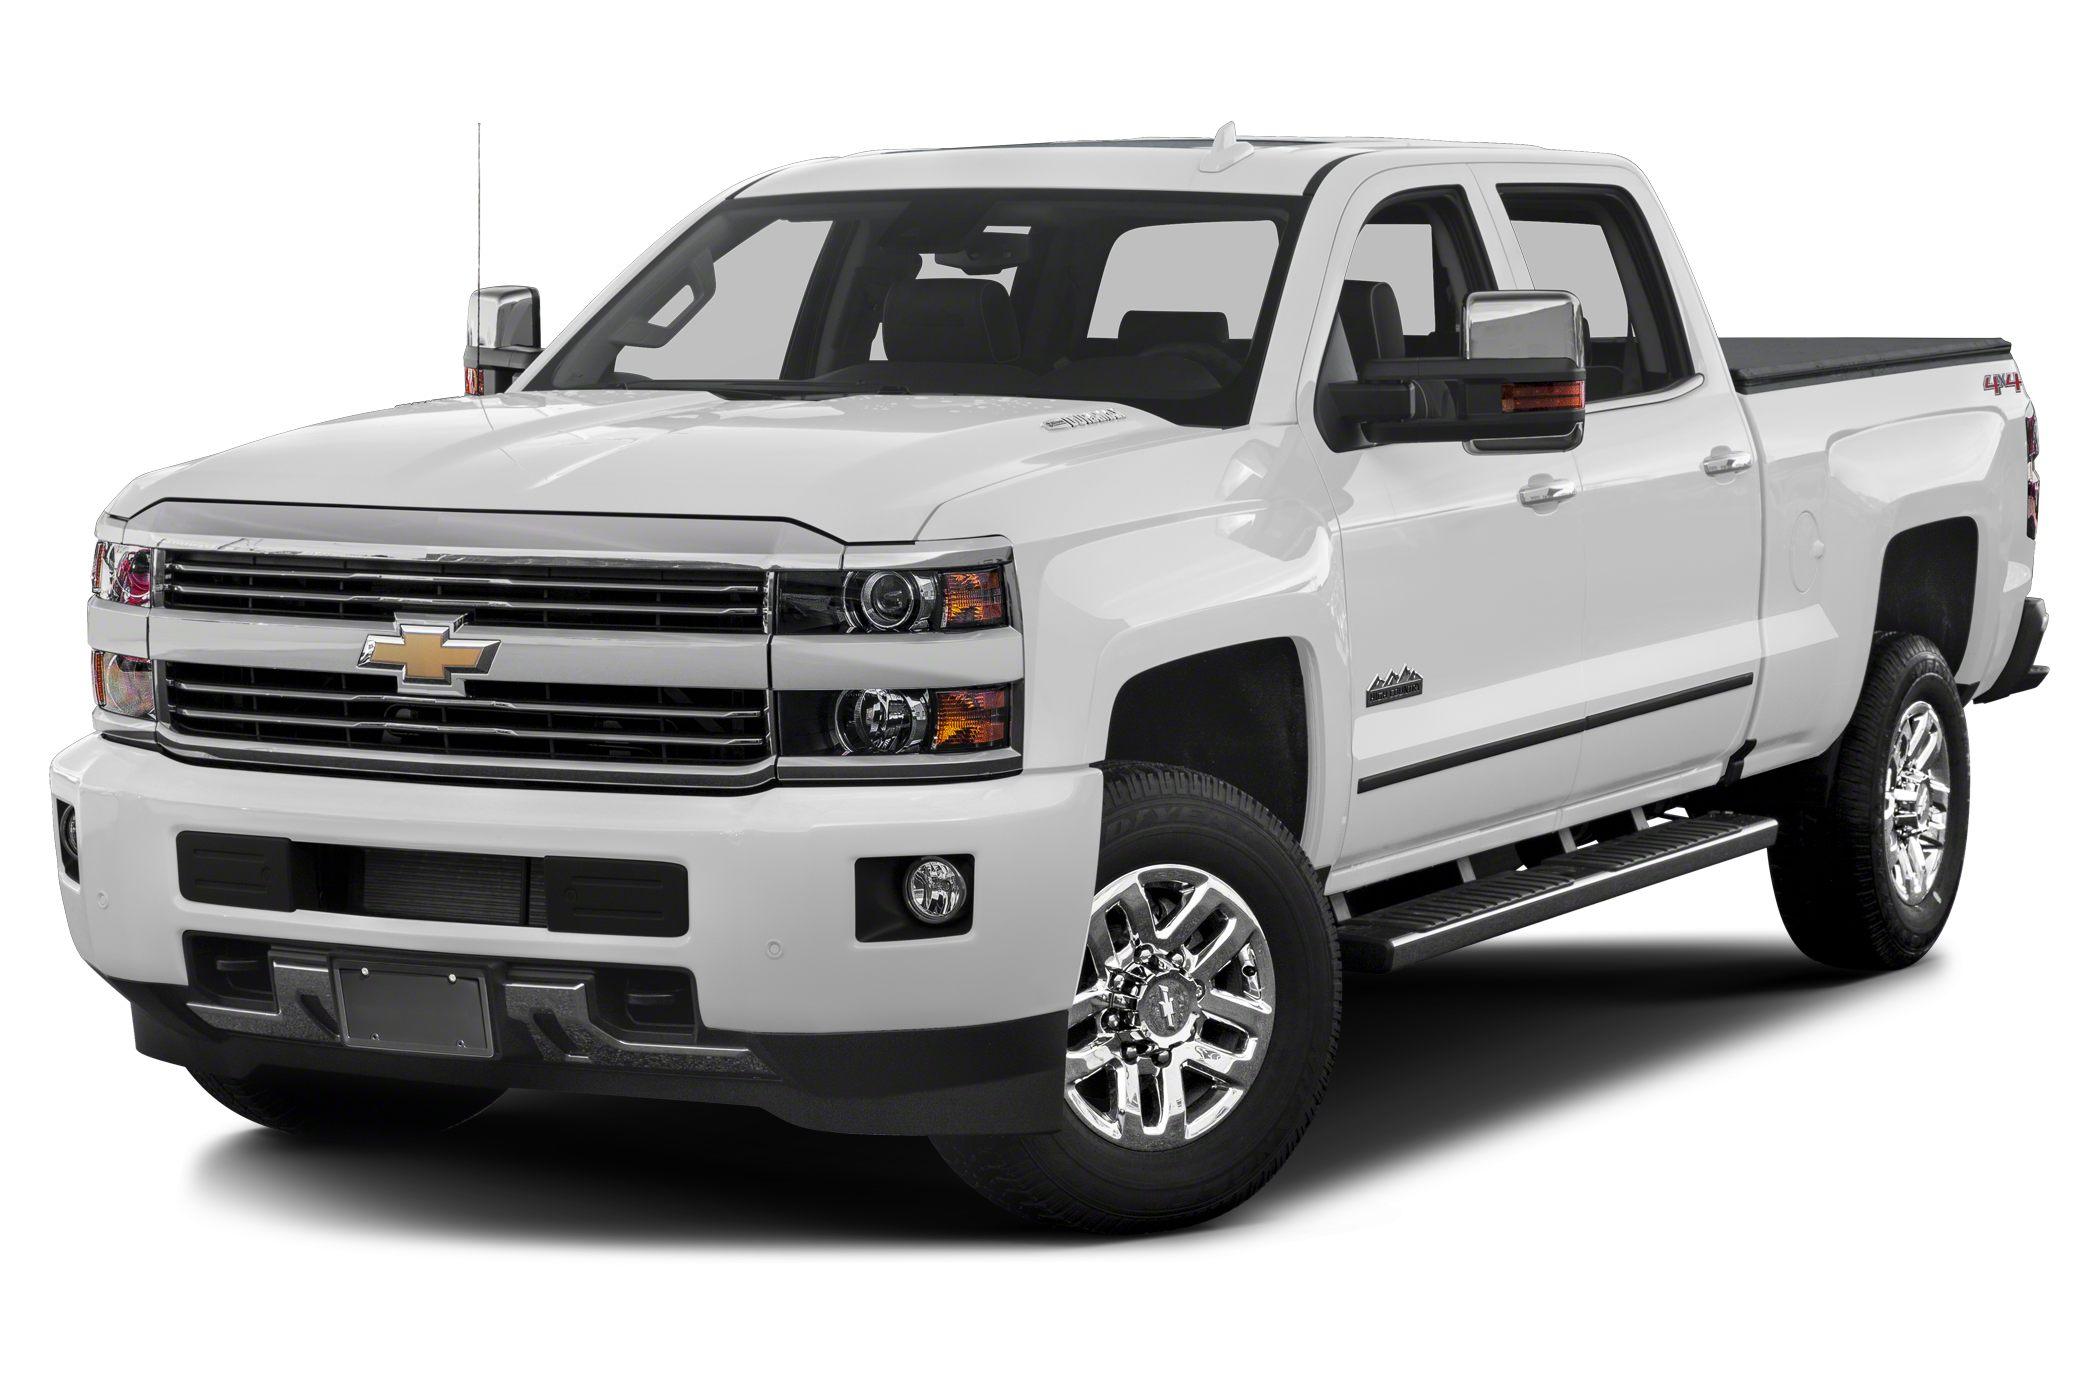 Chevrolet Silverado 2500hd Trucks For Sale Near Me Autos